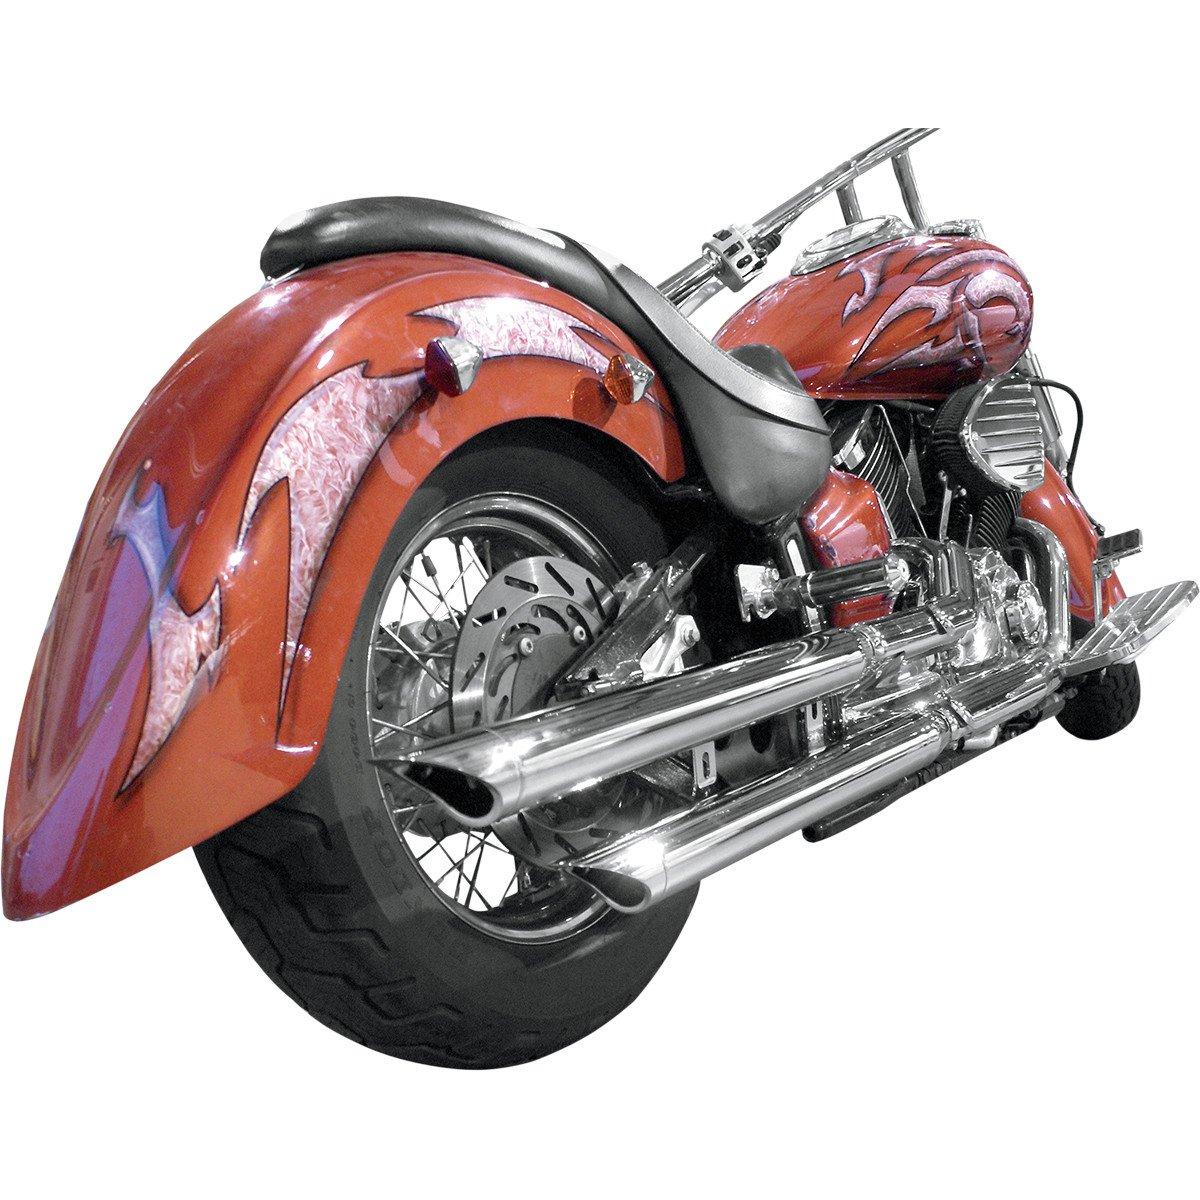 Caltric 2 Exhaust Muffler Pipe Head Gasket for Yamaha 3Eg-14613-00-00 4X7-14613-00-00